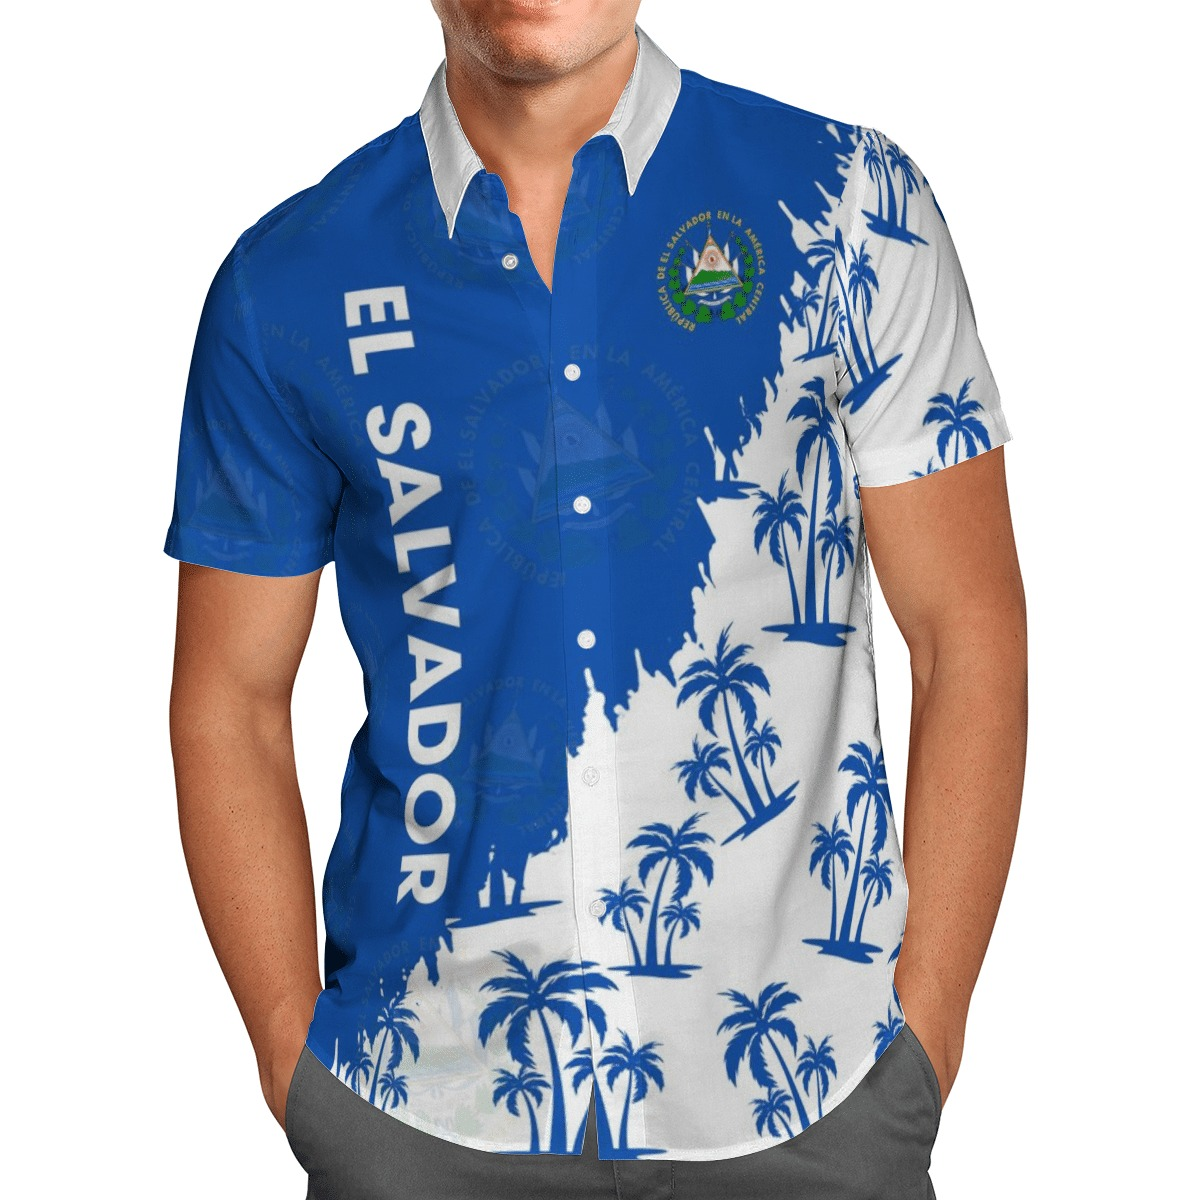 el salvador half blue and white hawaii shirt